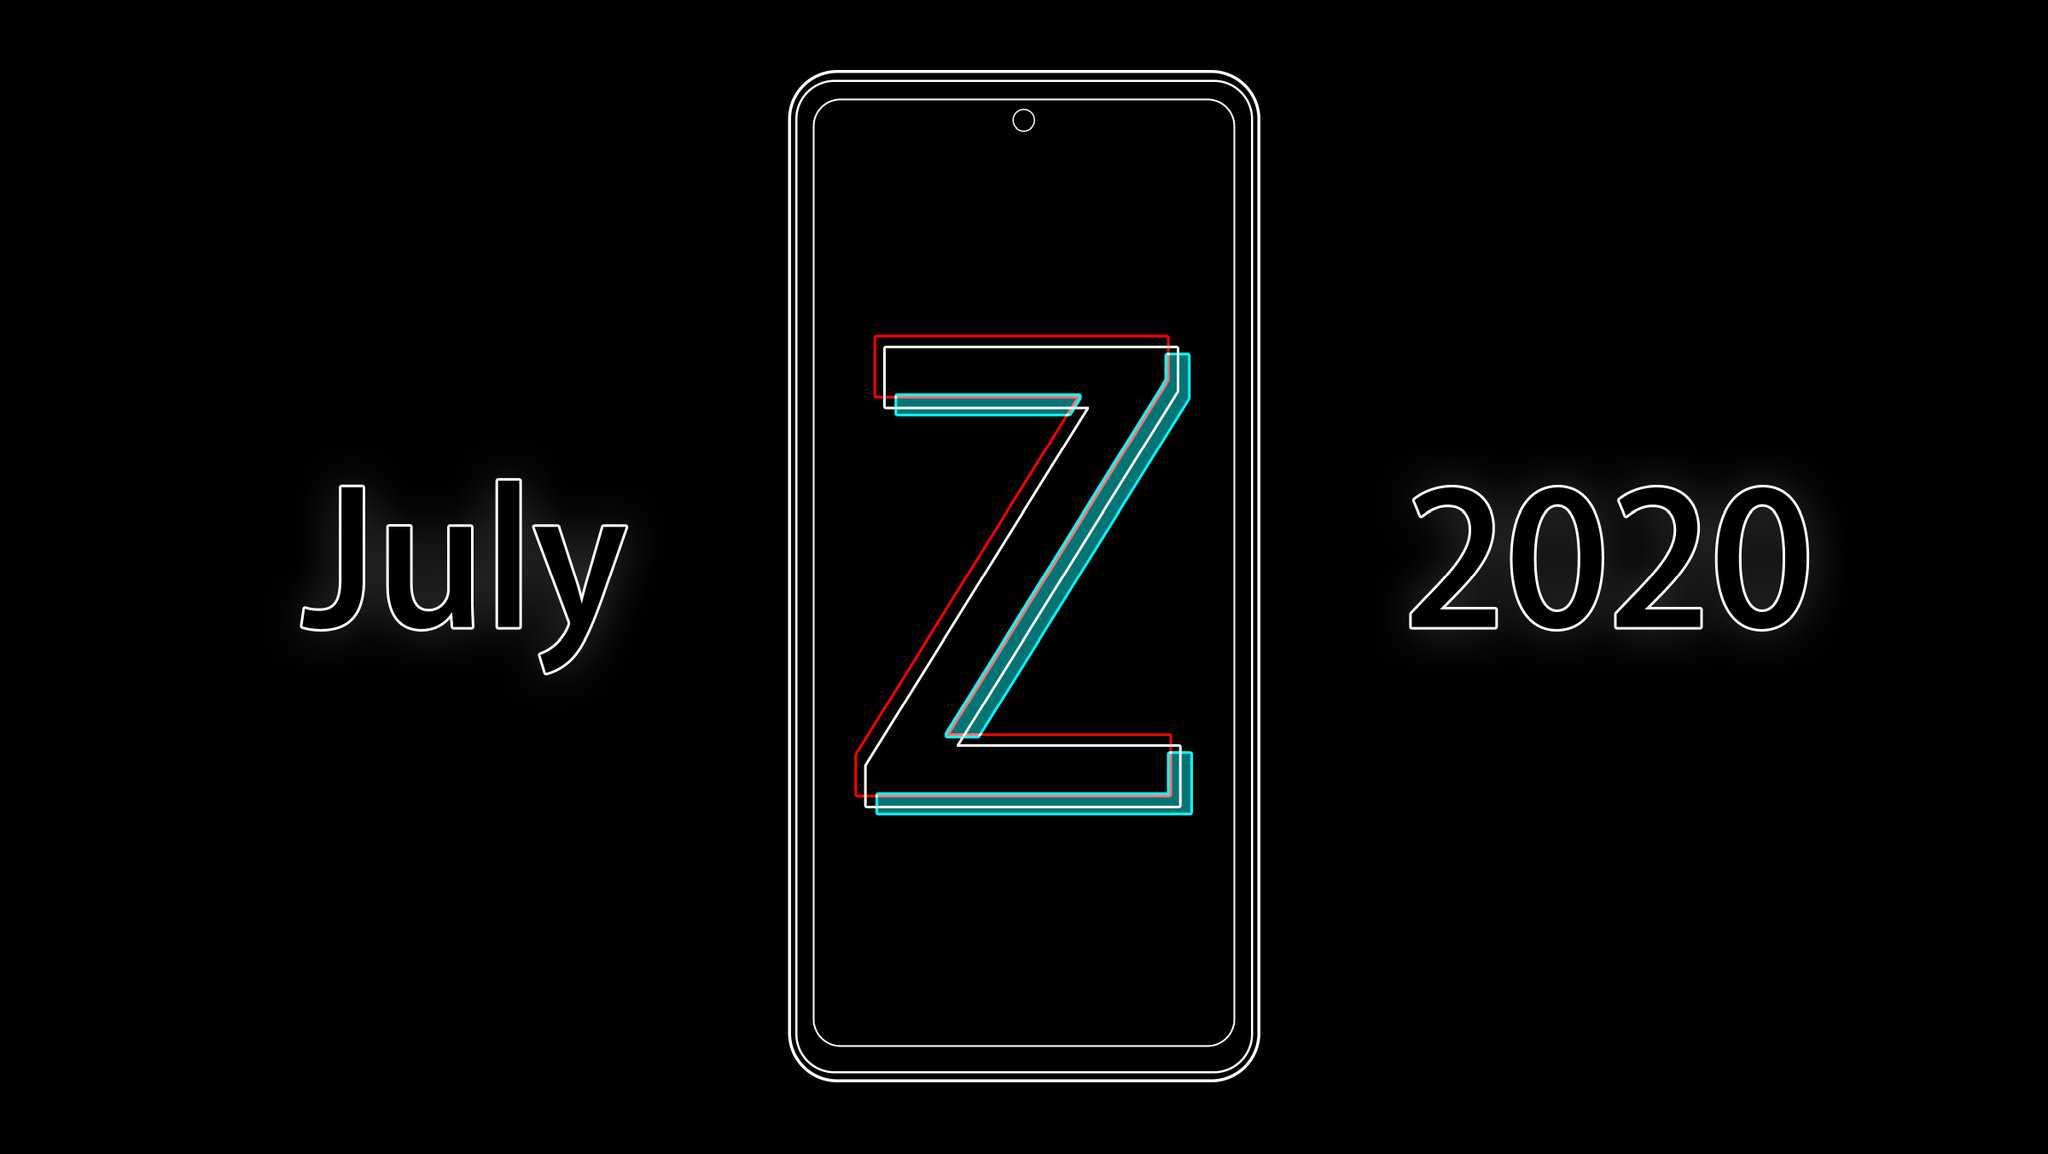 OnePlus Z July launch